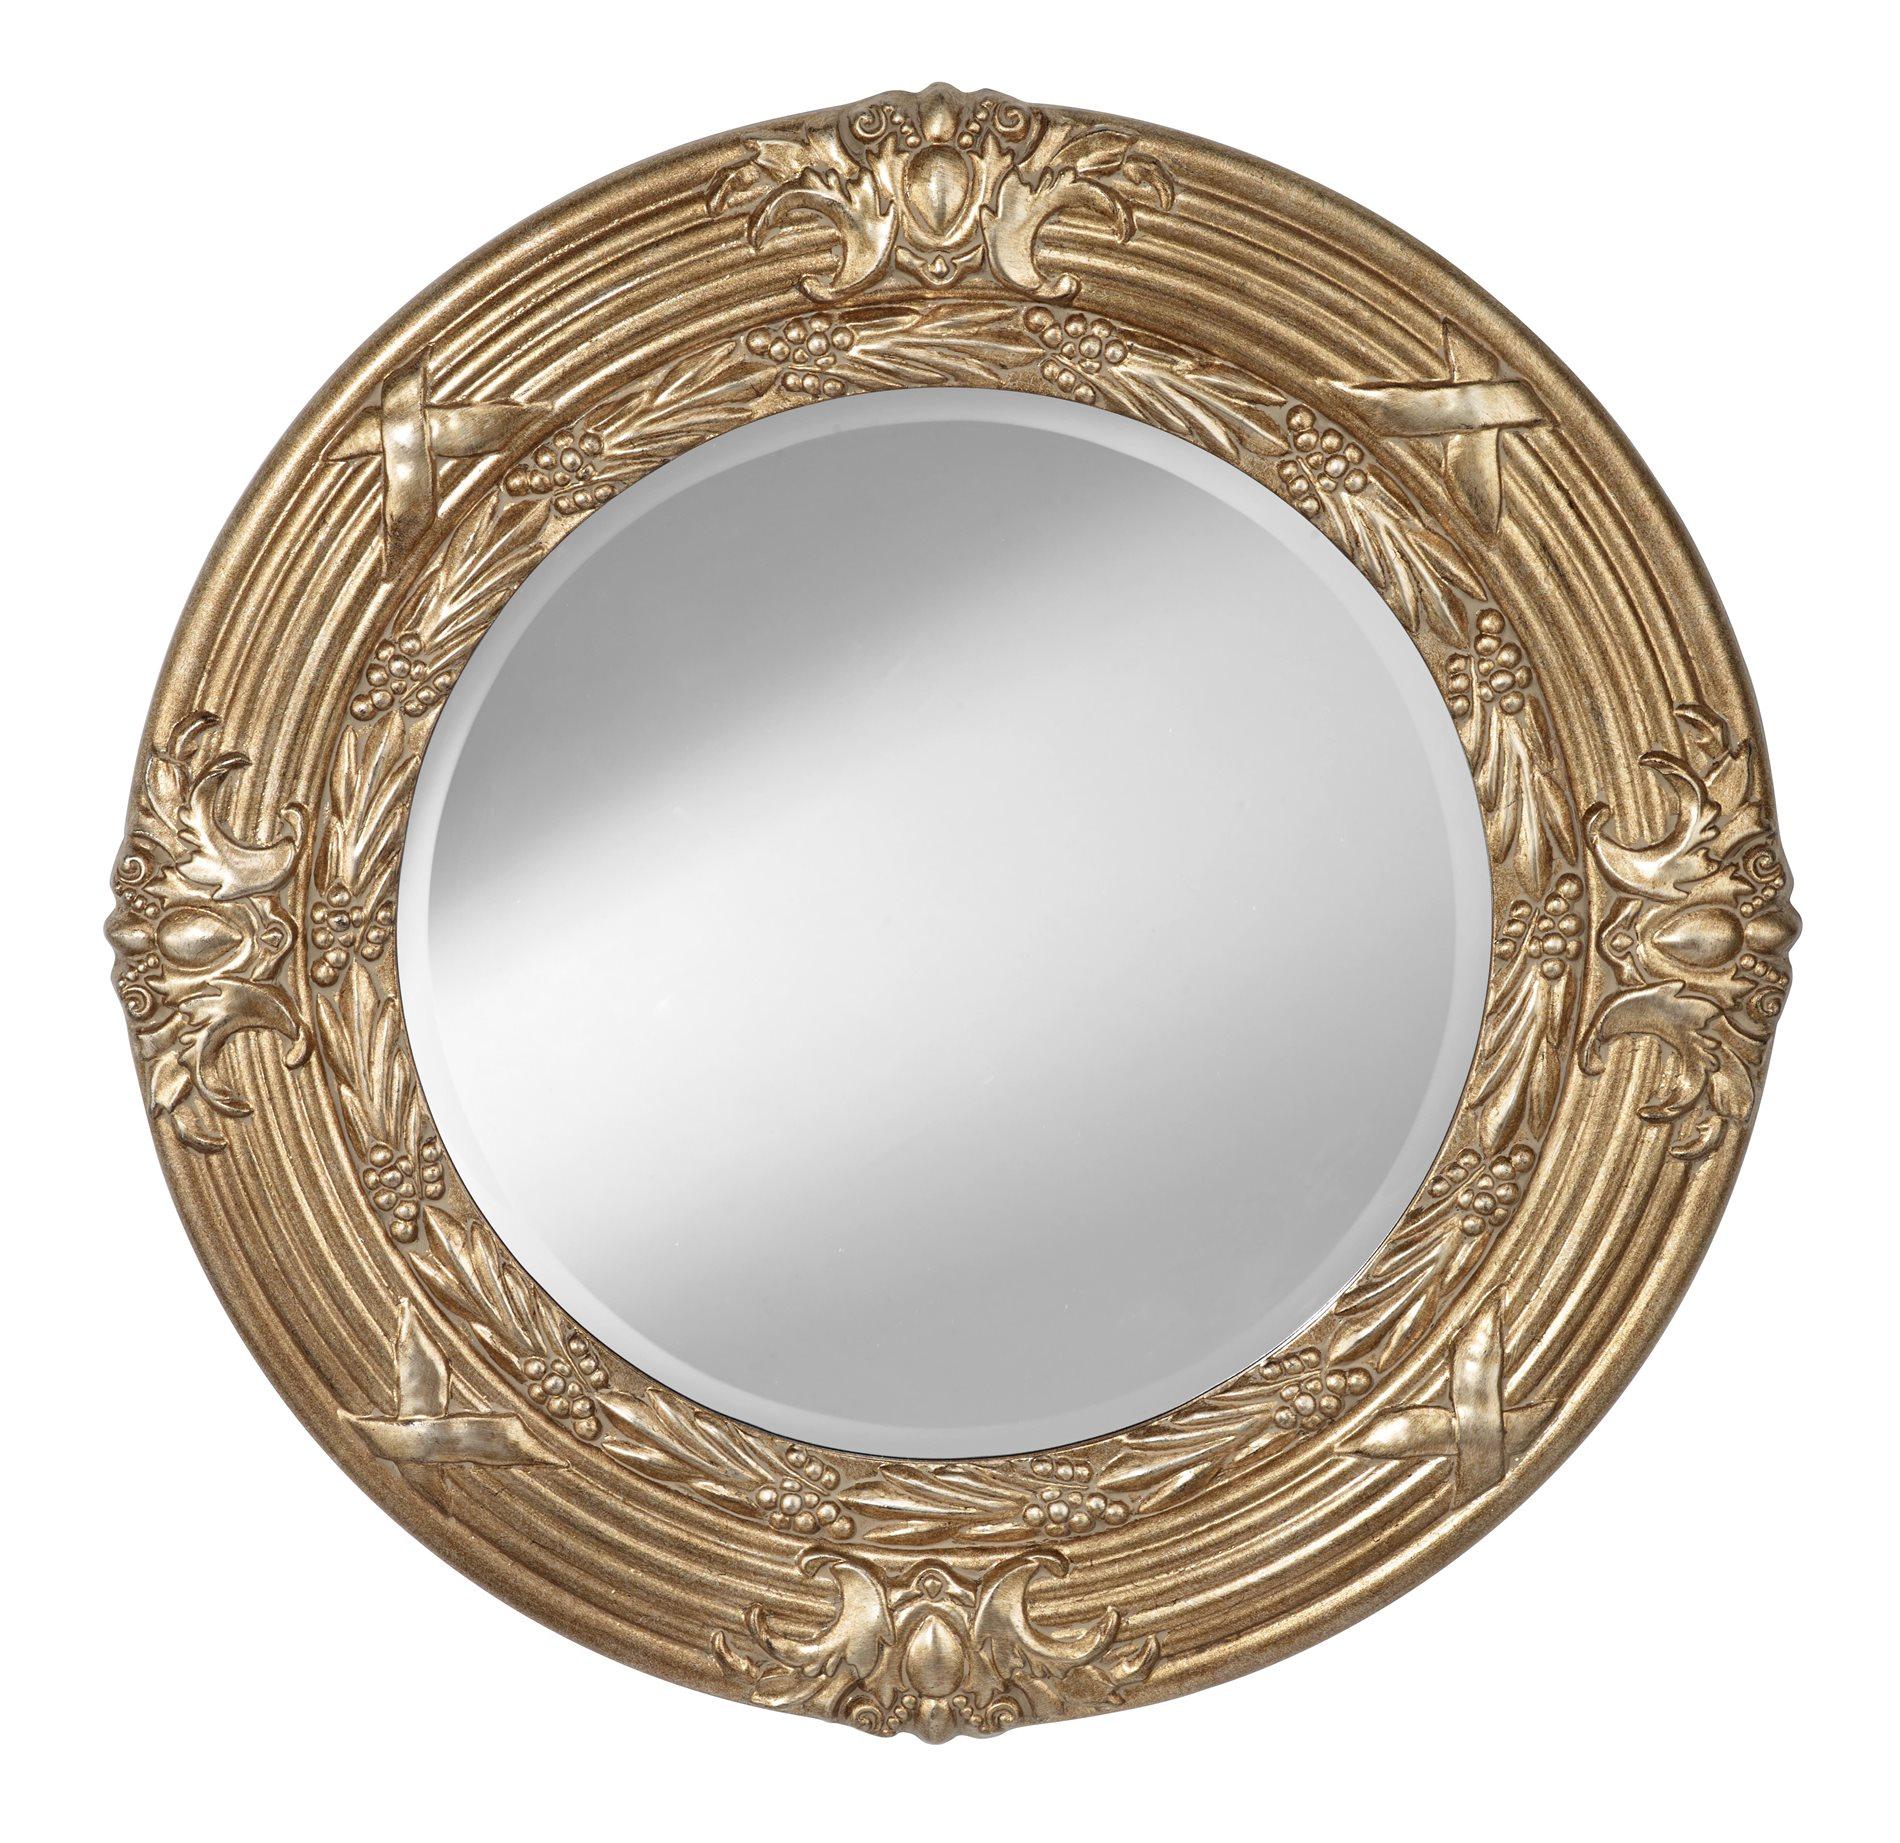 Murray Feiss Mirrors: Murray Feiss MR1202CHP Mirror MRF-MR1202CHP